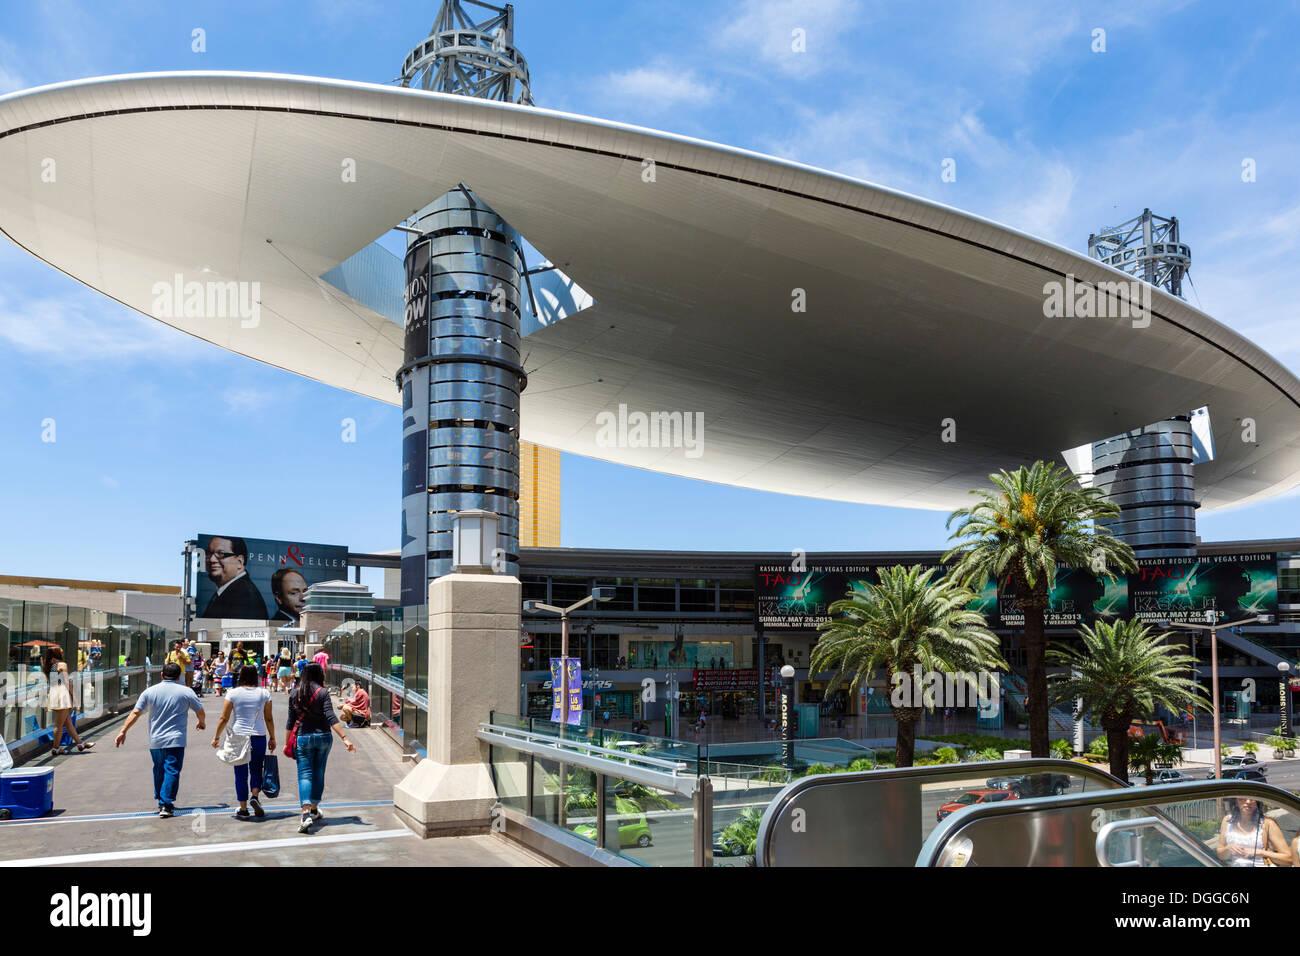 The Cloud at the Fashion Show Mall, Las Vegas Boulevard South (The Strip), Las Vegas, Nevada, USA - Stock Image